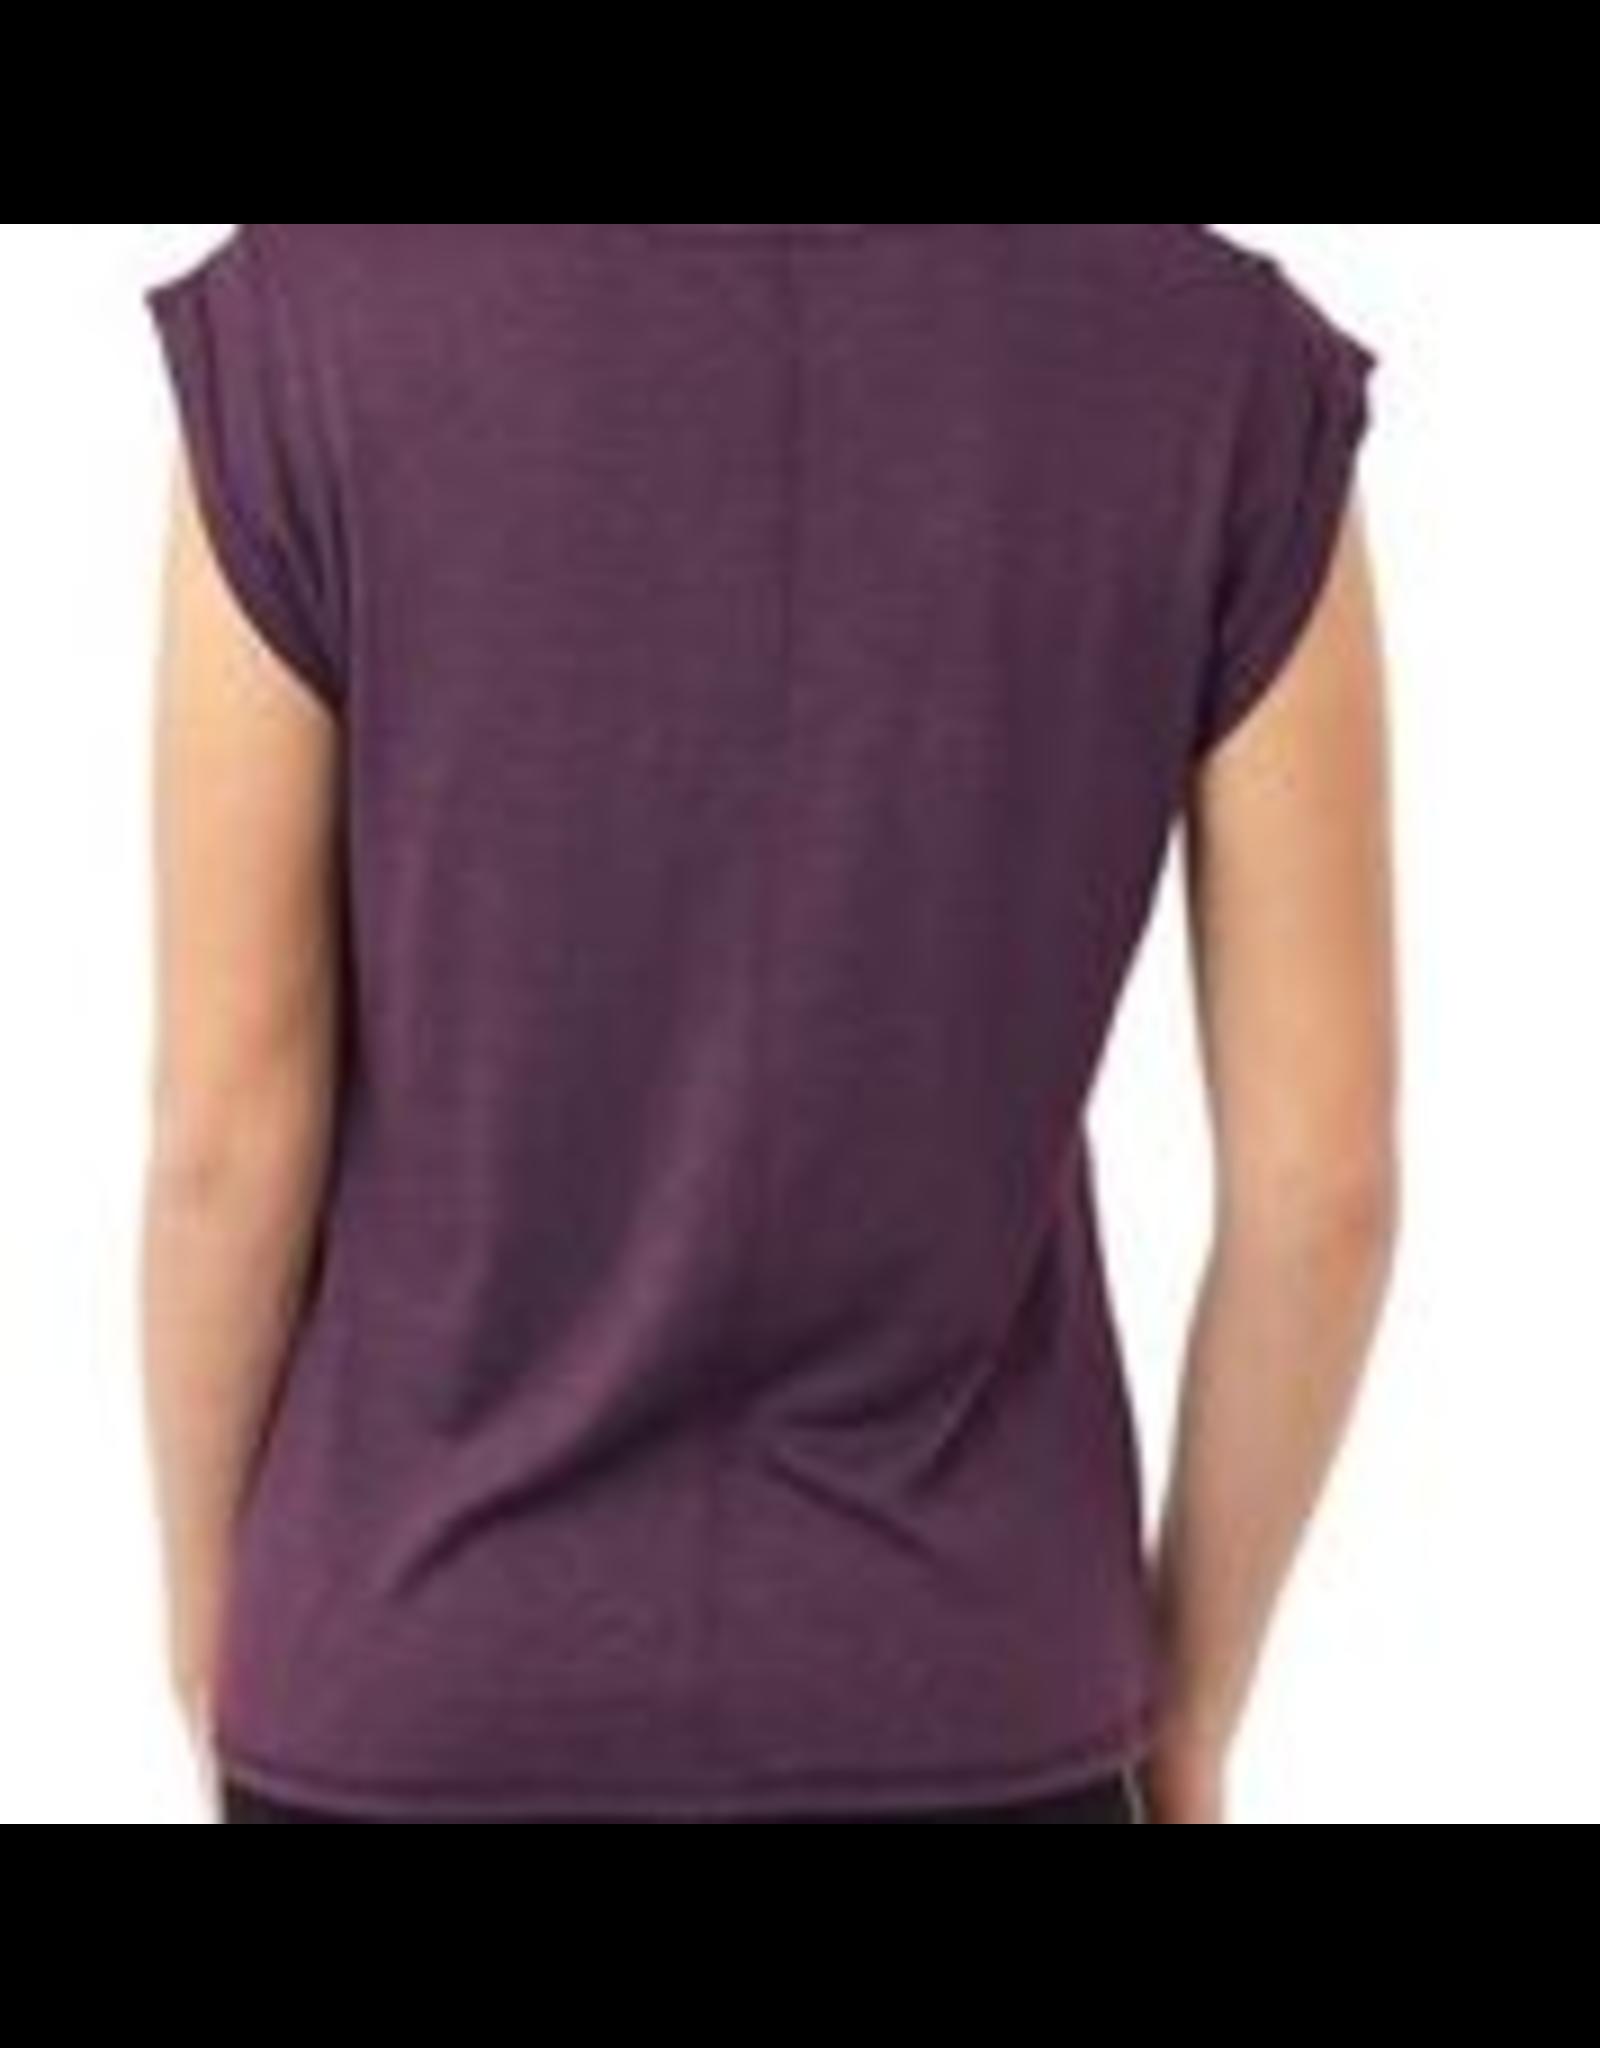 Mandala TS42JE10 Easy V neck